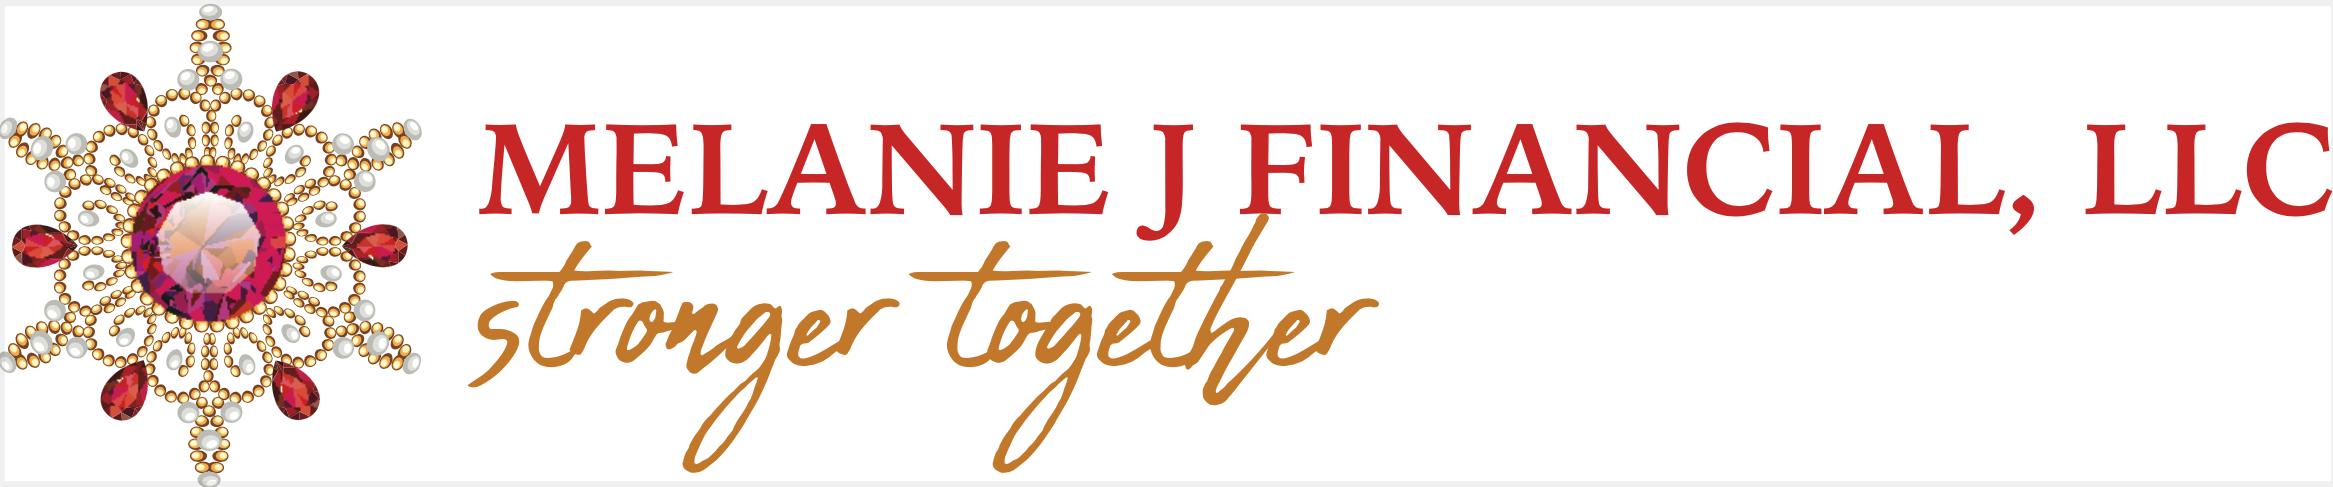 Melanie J Financial Brand Logo